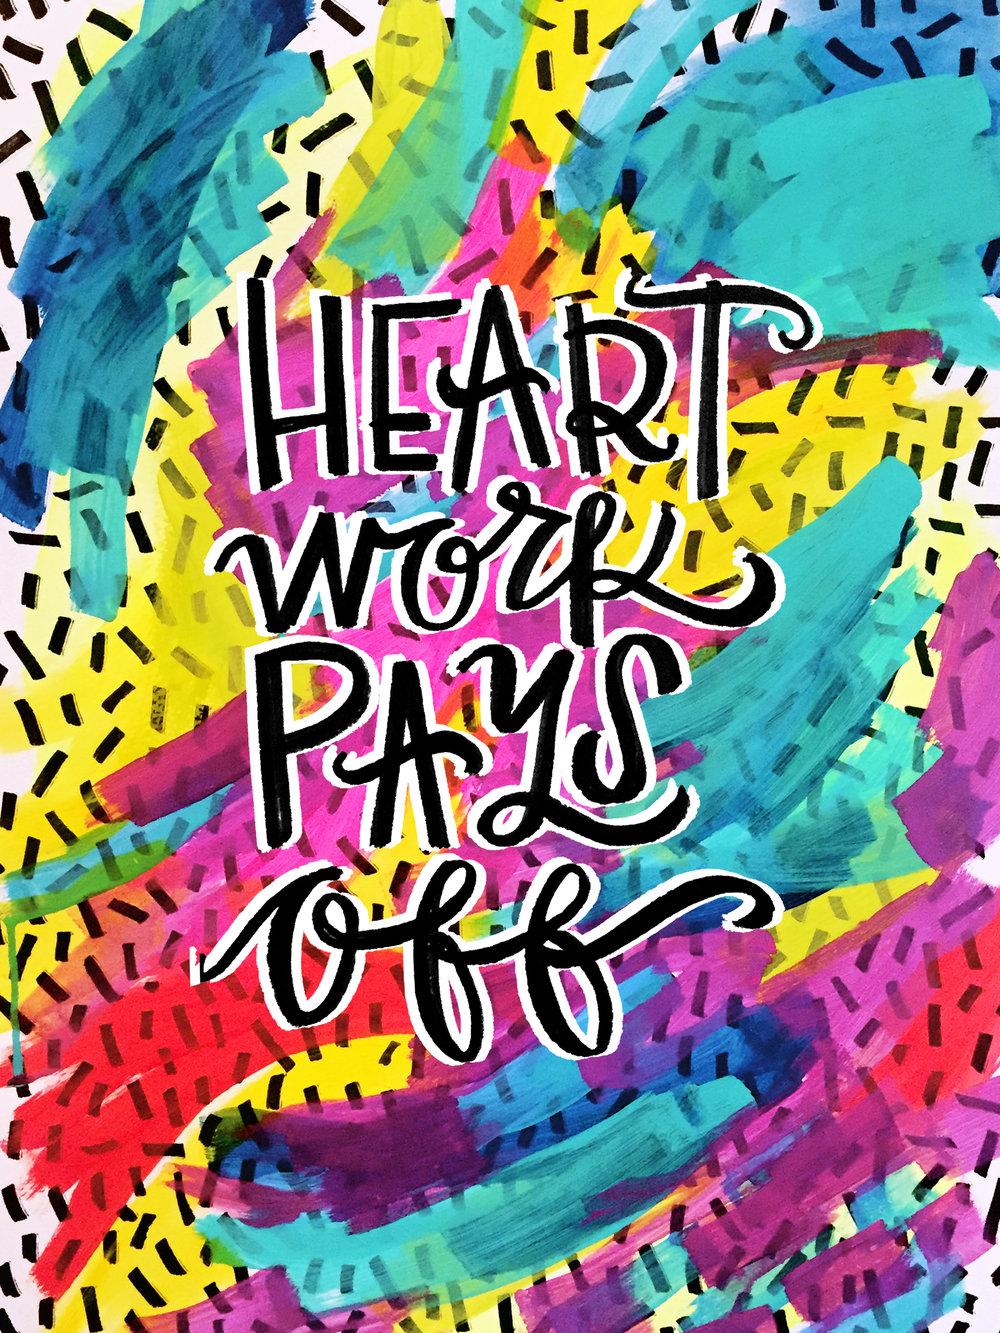 3/2/16: Heart